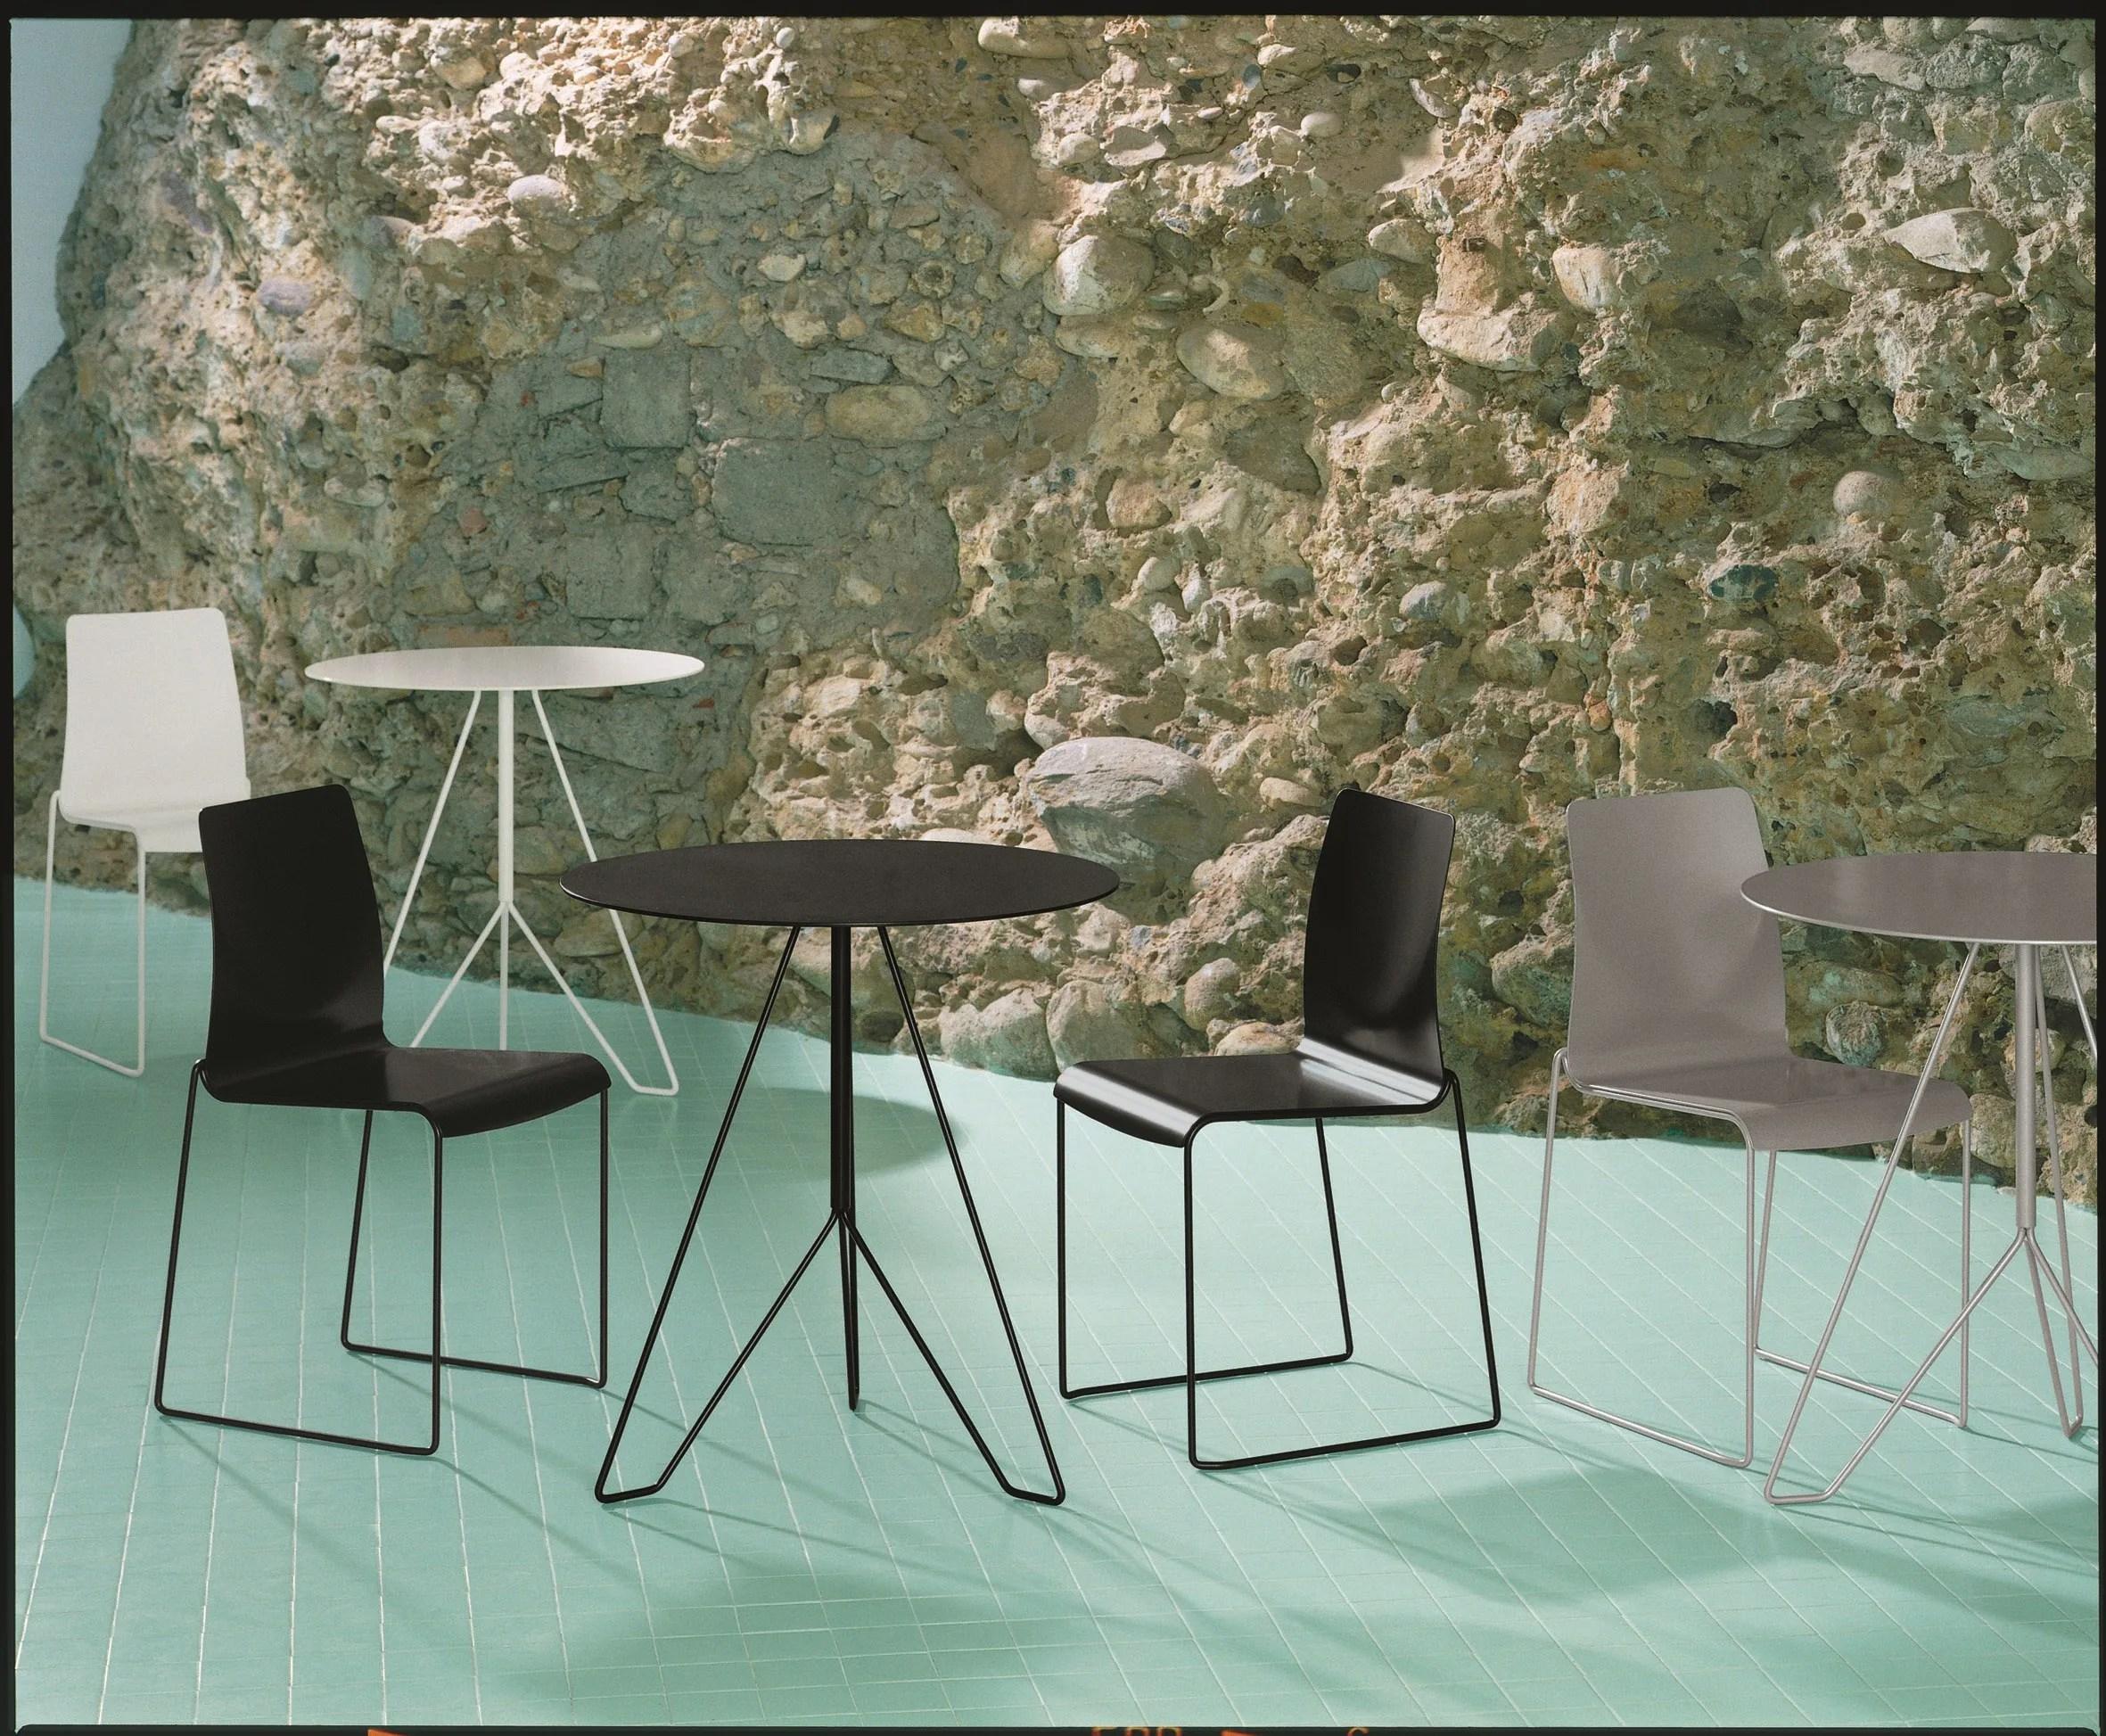 fire retardant chairs wheelchair transport camilla chair by ydf design basaglia rota nodari